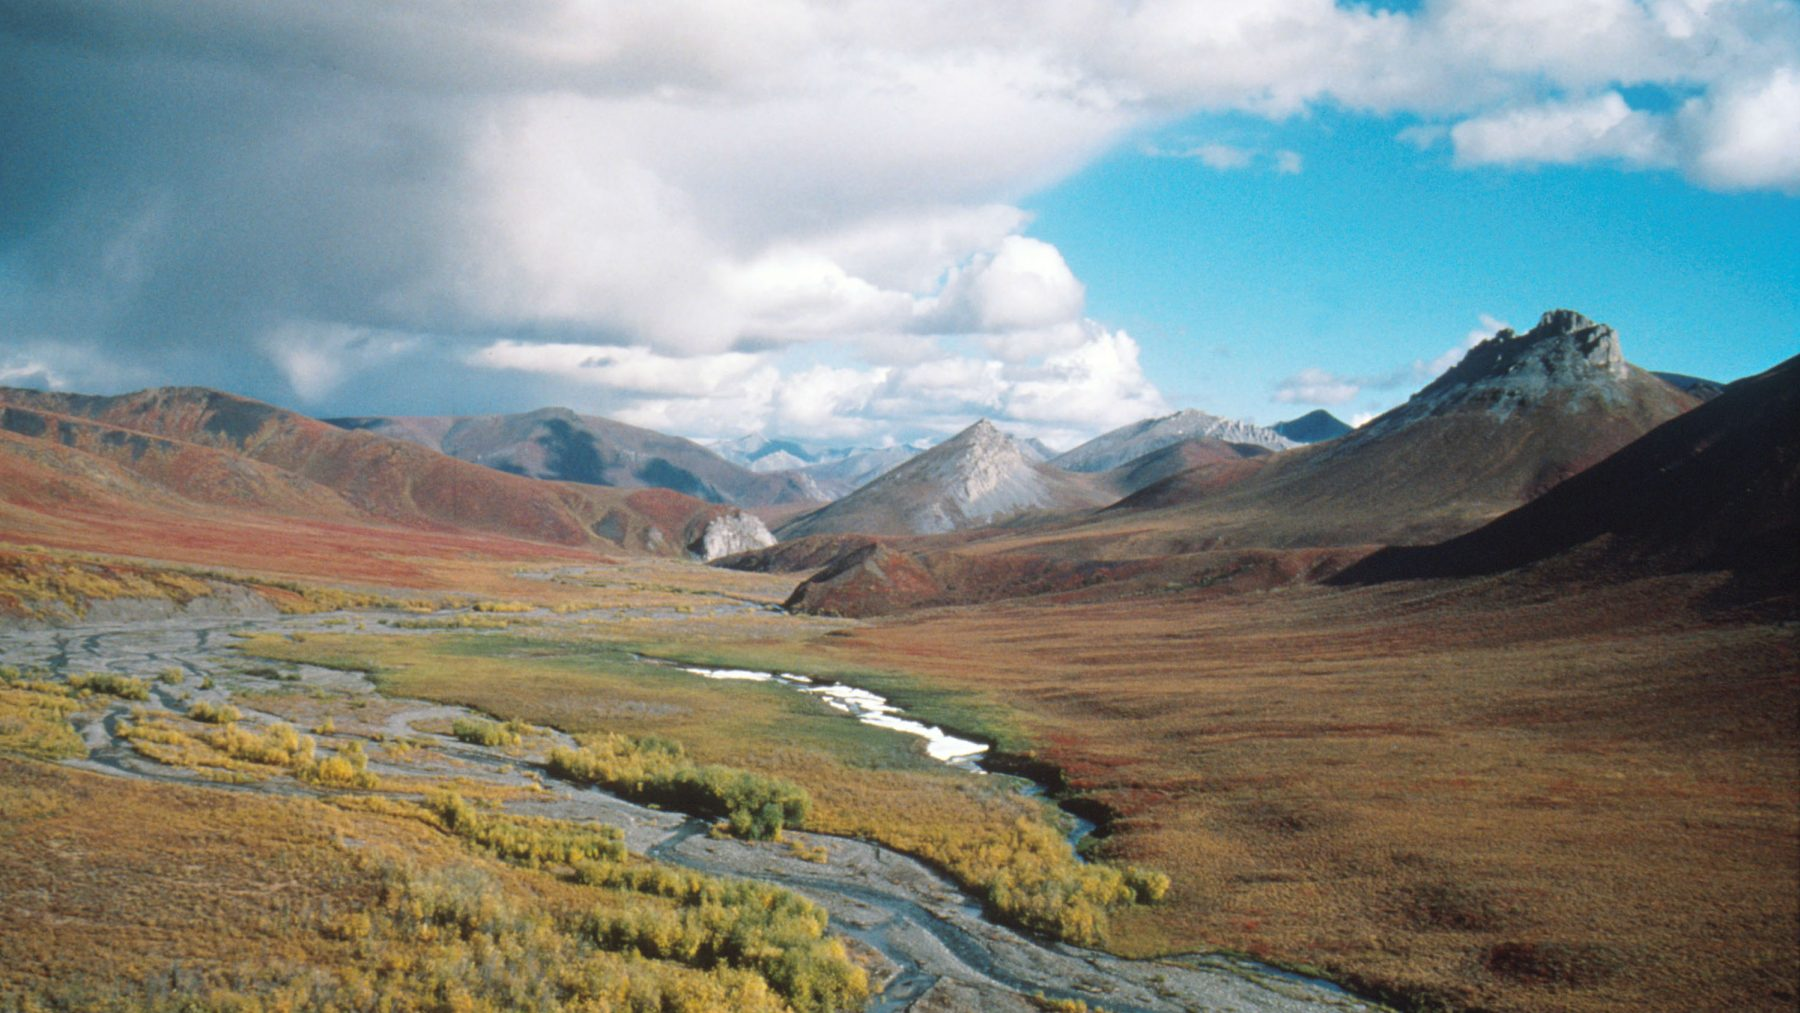 Democrats continue fight against drilling in Arctic wildlife refuge in U.S. Congress